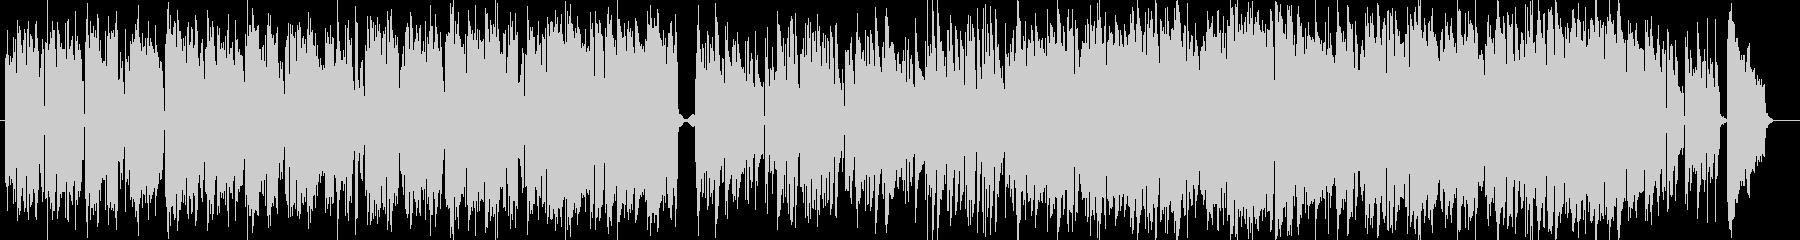 Accordion is fashionable Bossa Nova's unreproduced waveform